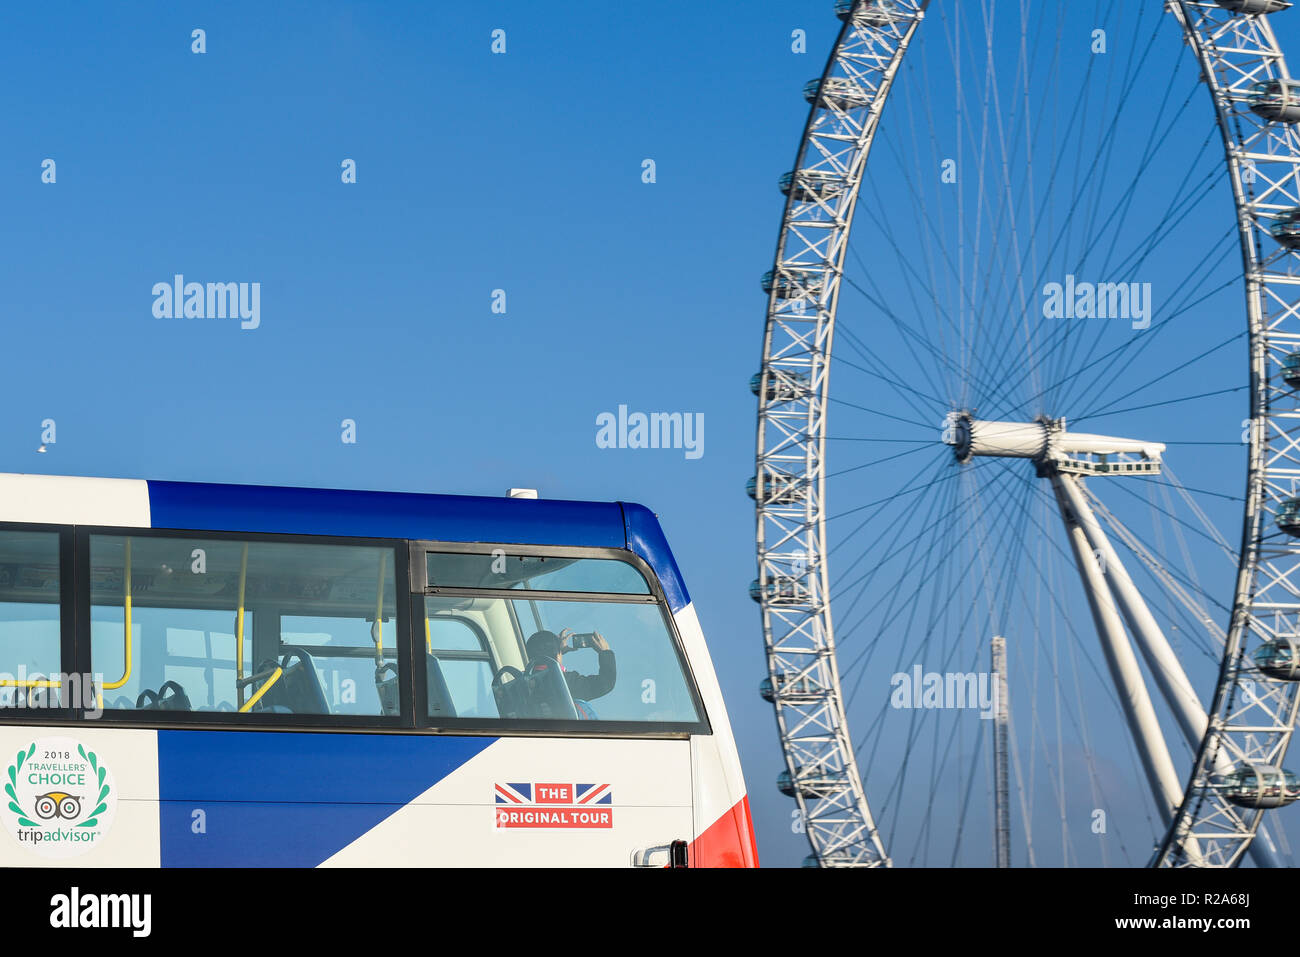 a-tourist-on-a-british-tour-bus-taking-a-mobile-phone-camera-phone-photograph-of-the-london-eye-millennium-wheel-tripadvisor-the-original-tour-R2A68J.jpg